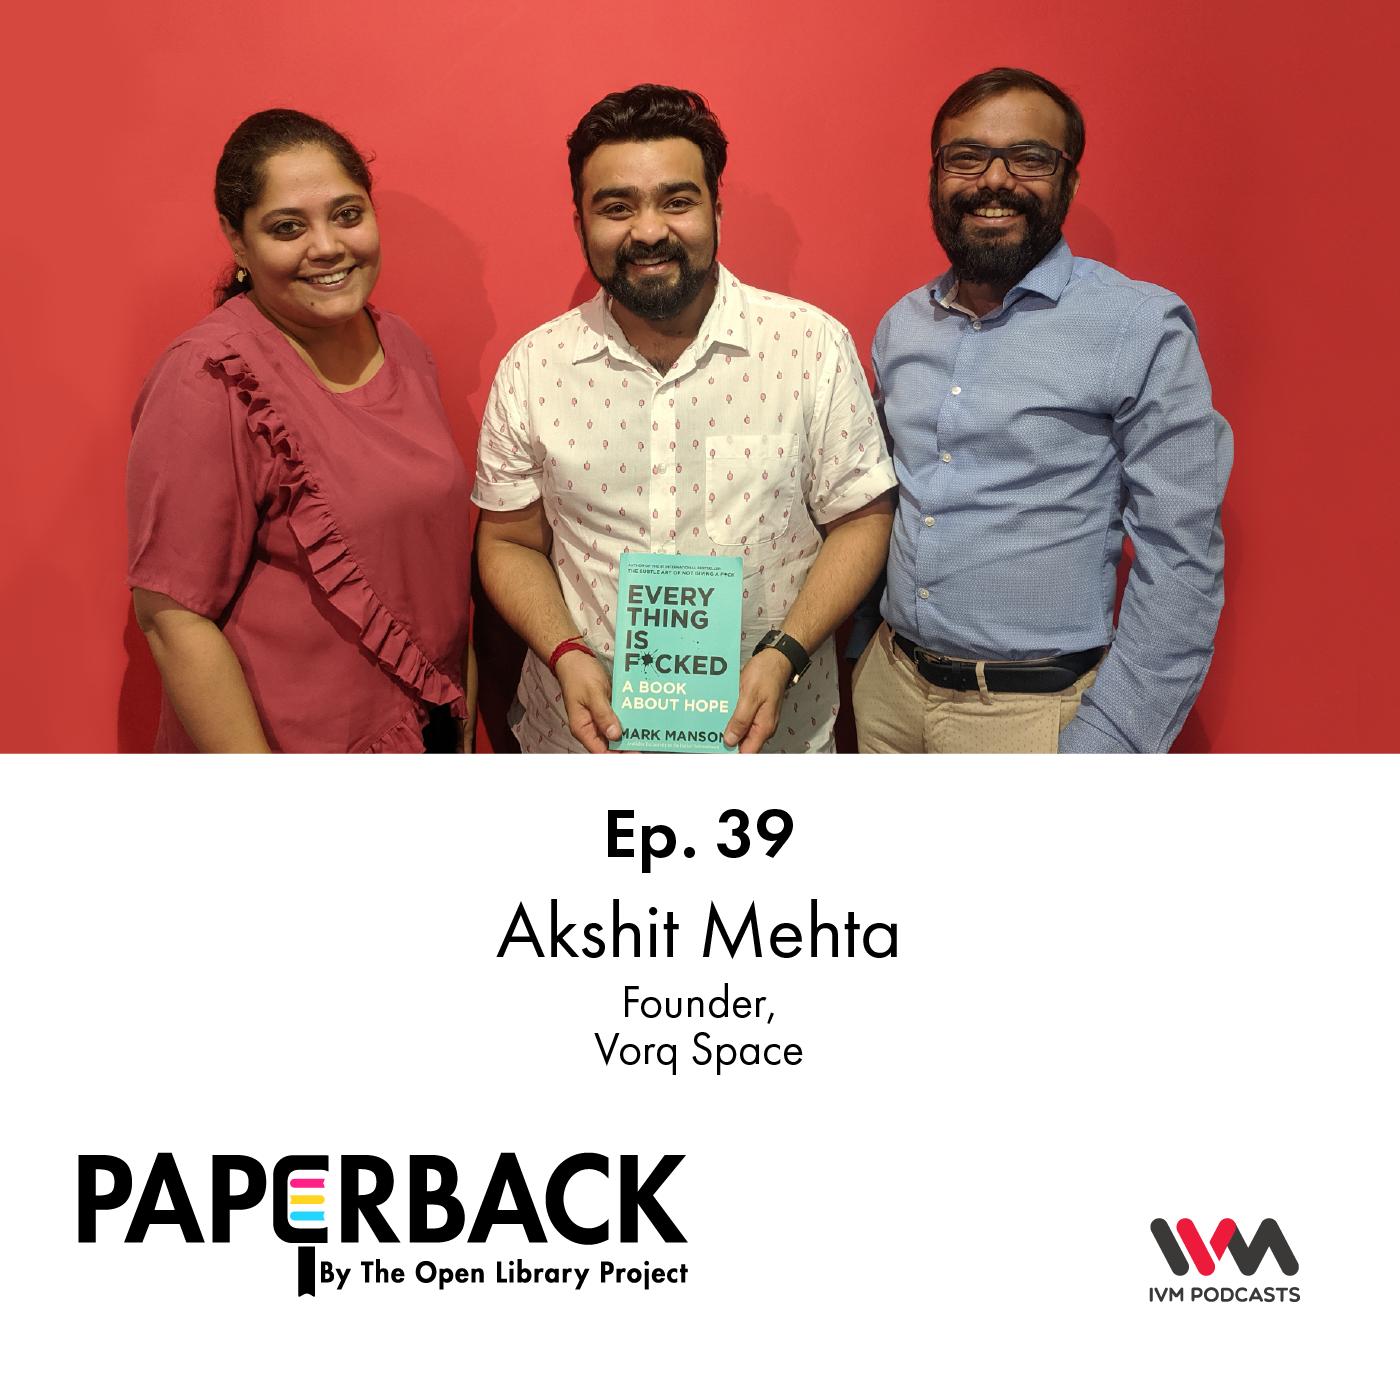 Ep. 39: Akshit Mehta